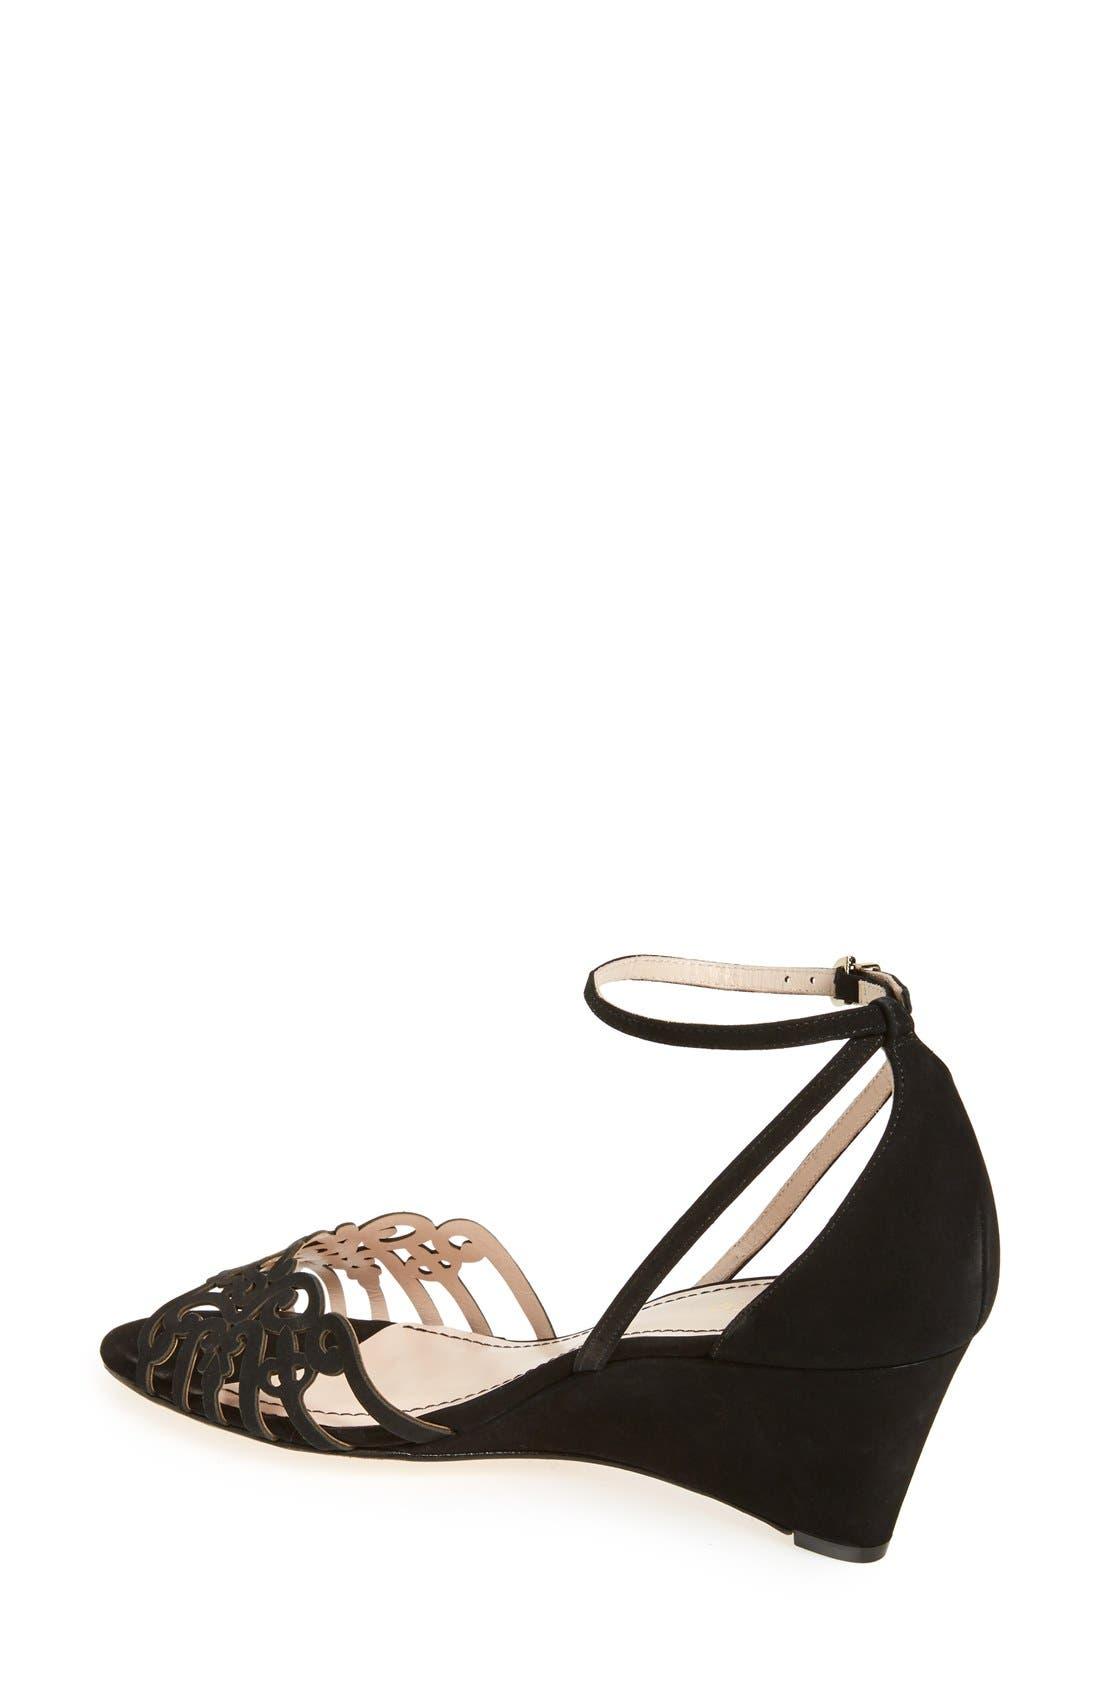 'Kingston' Ankle Strap Wedge Sandal,                             Alternate thumbnail 2, color,                             Black Nubuck Leather